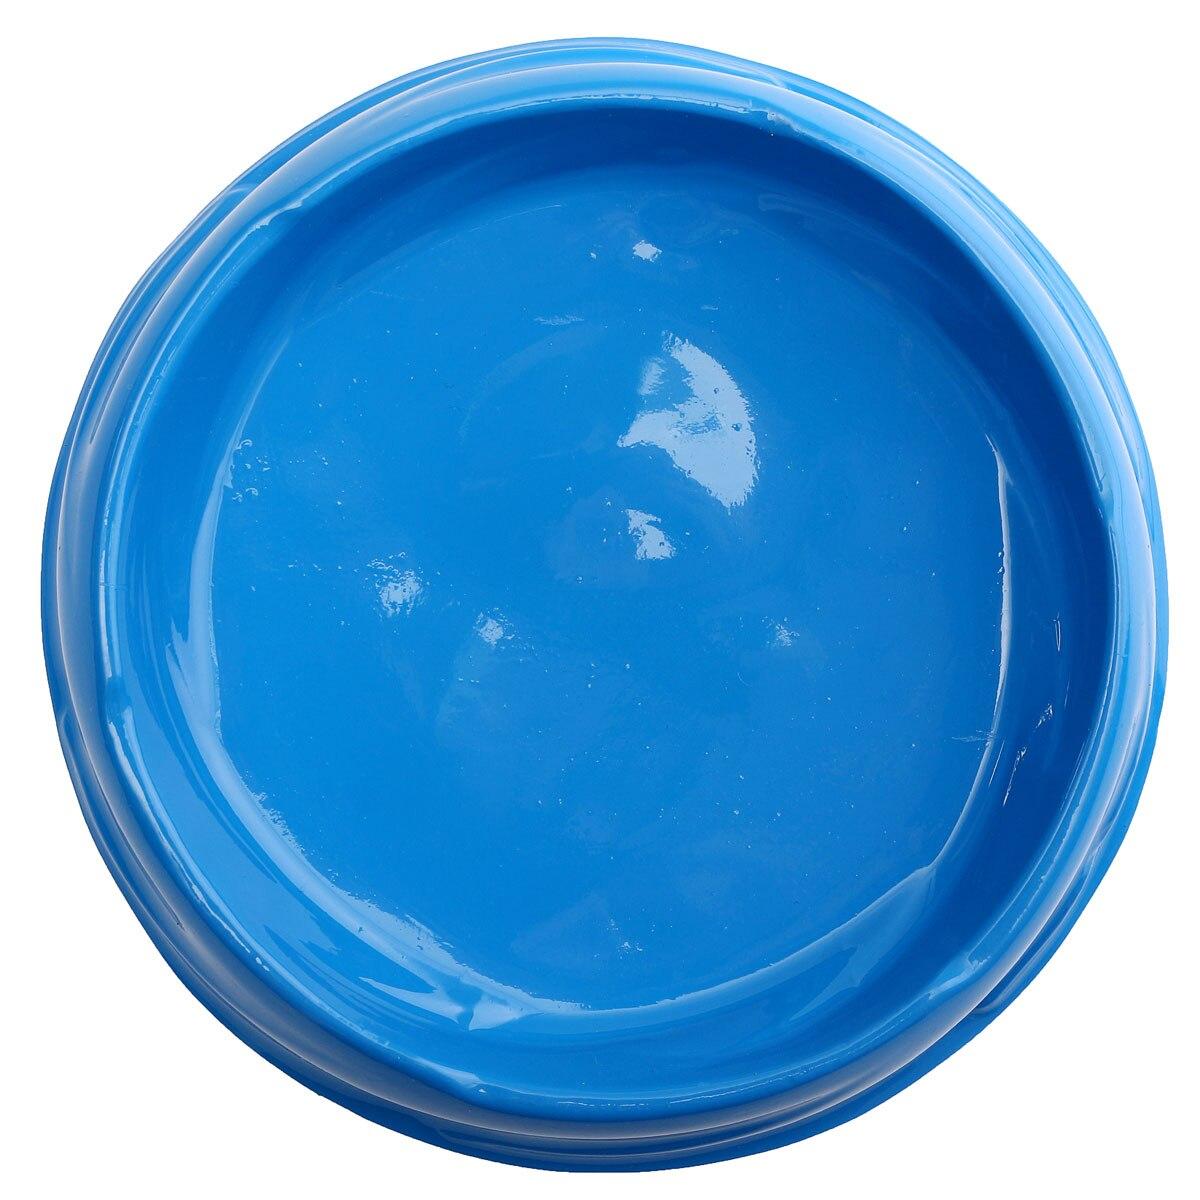 Breathtaking Baby Blue Plastic Plates Contemporary - Best Image ... Breathtaking Baby Blue Plastic Plates Contemporary Best Image  sc 1 st  Best Image Engine & Breathtaking Baby Blue Plastic Plates Contemporary - Best Image ...